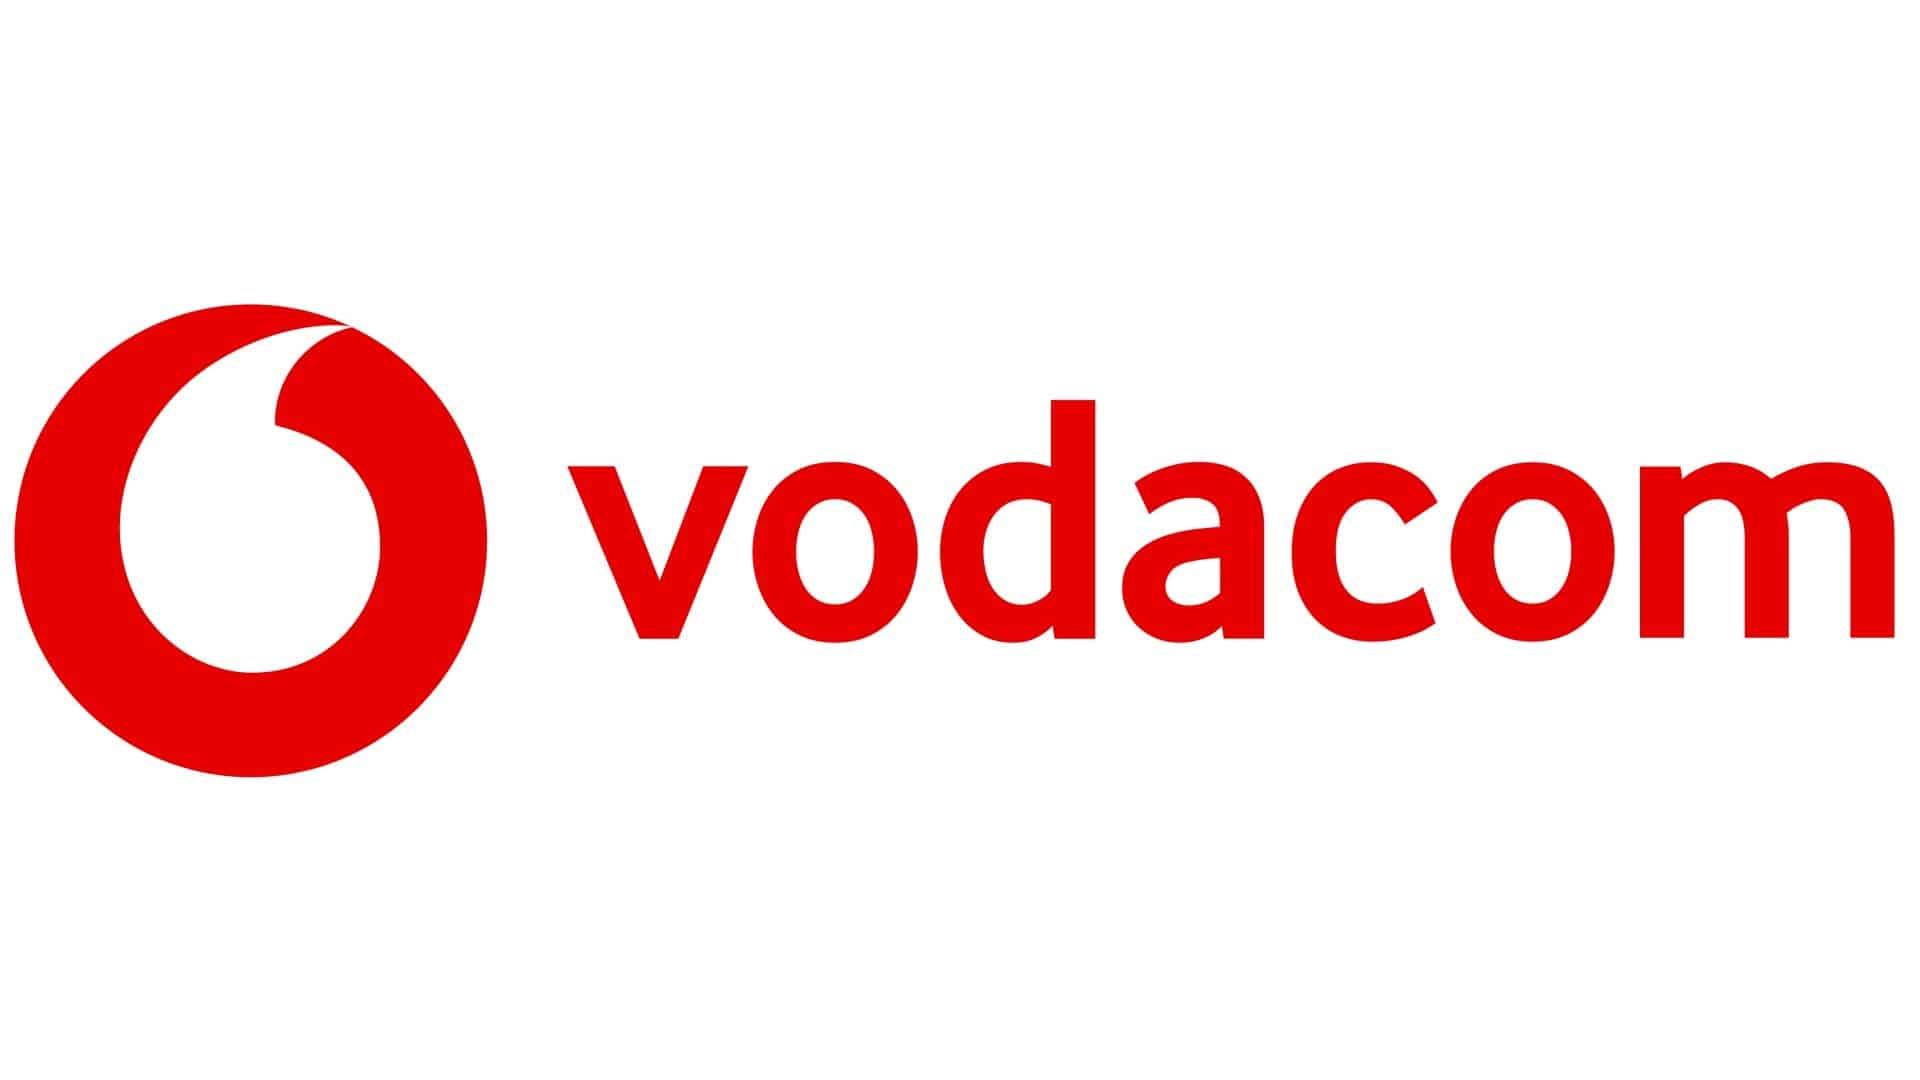 Vodacom 5G Pricing Rain